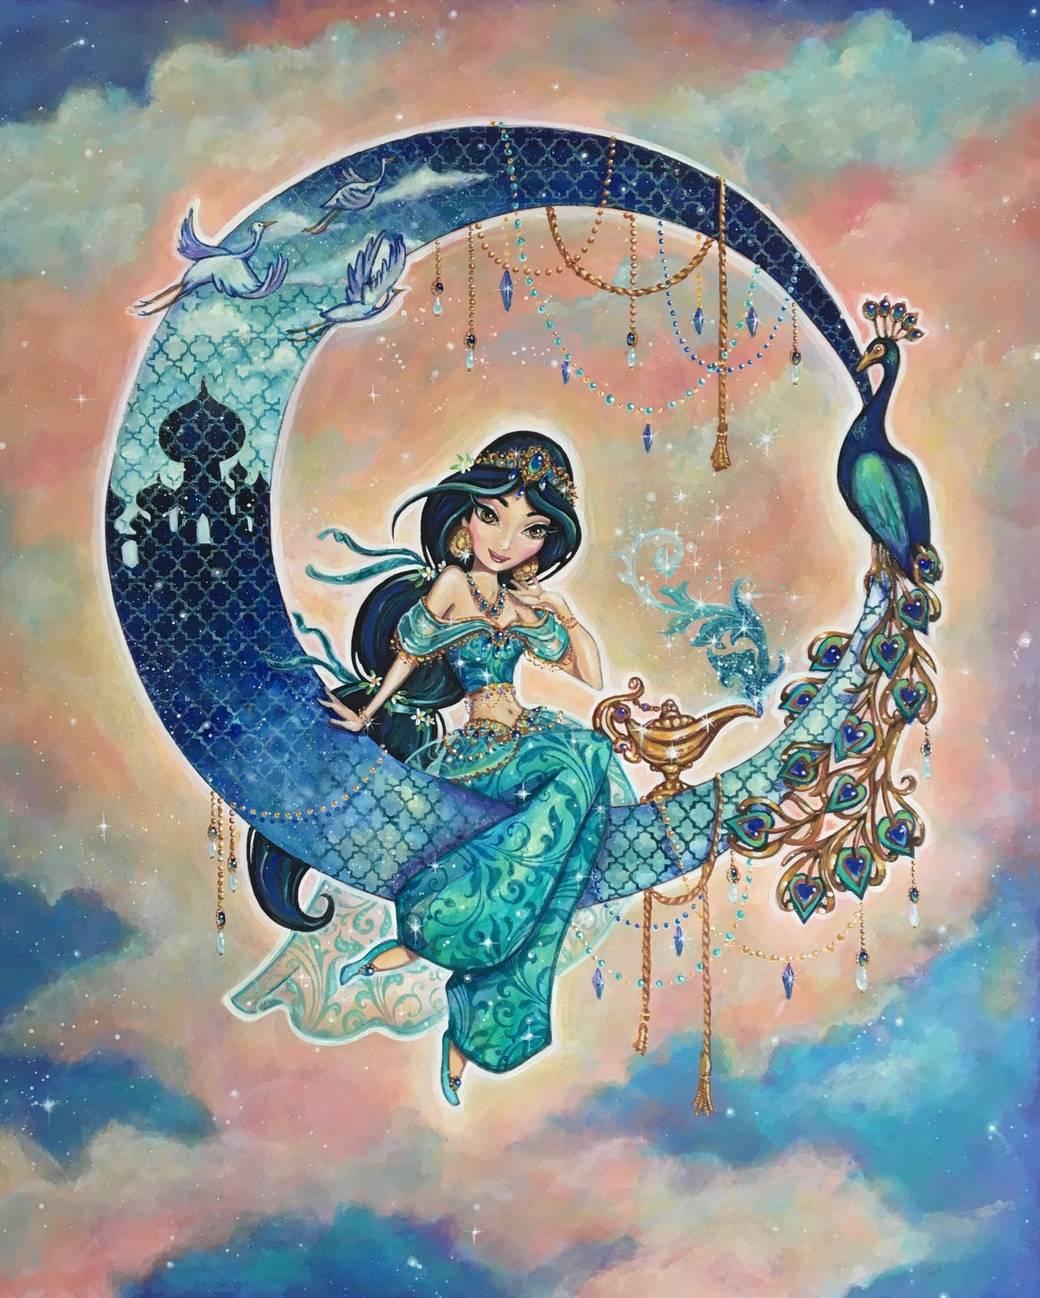 Princess Jasmine portrait by John Coulter